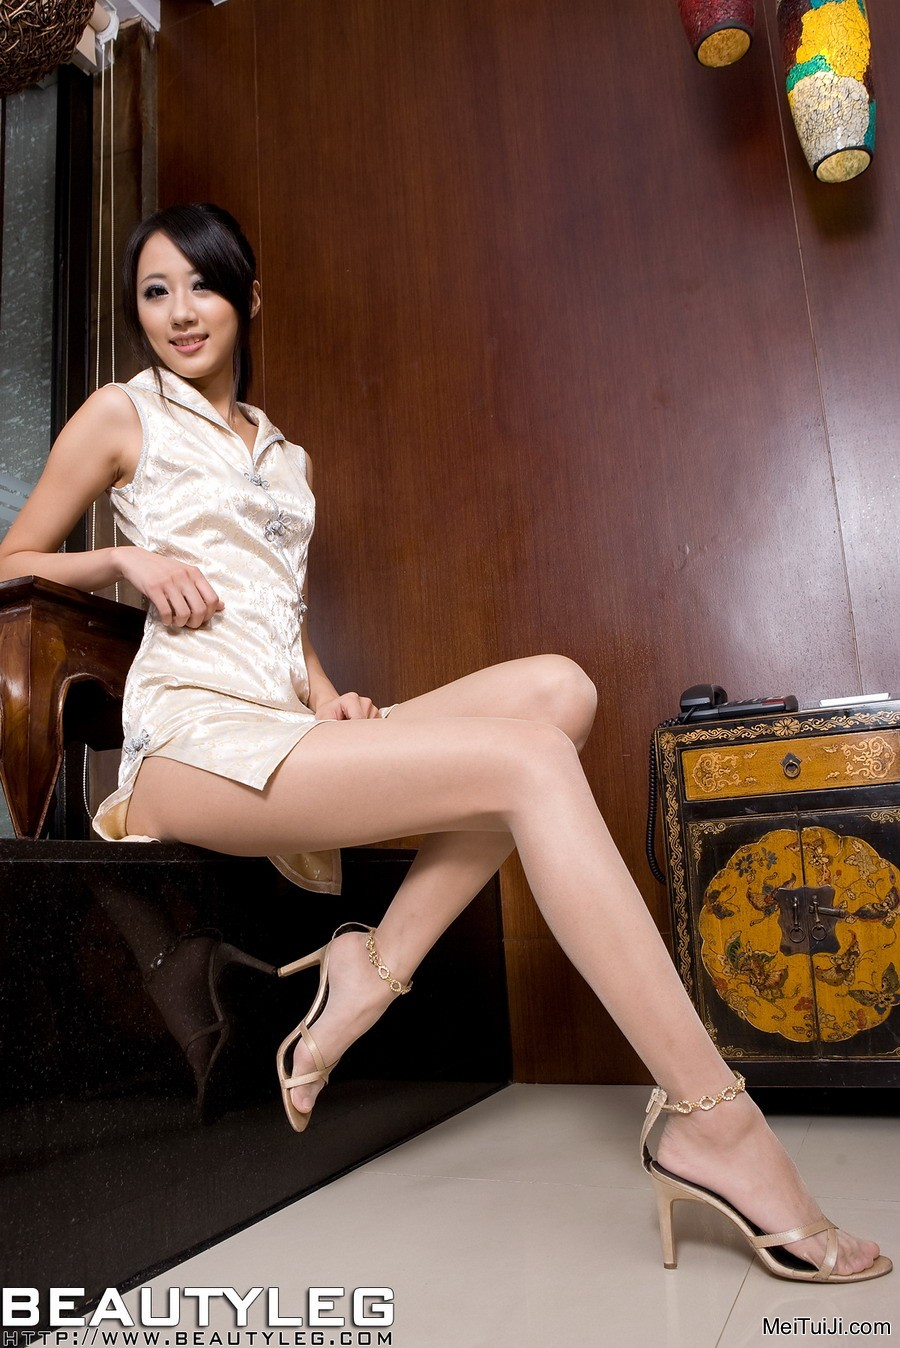 LIFE IS FUNNY JellyFishA beautyleg girl from china